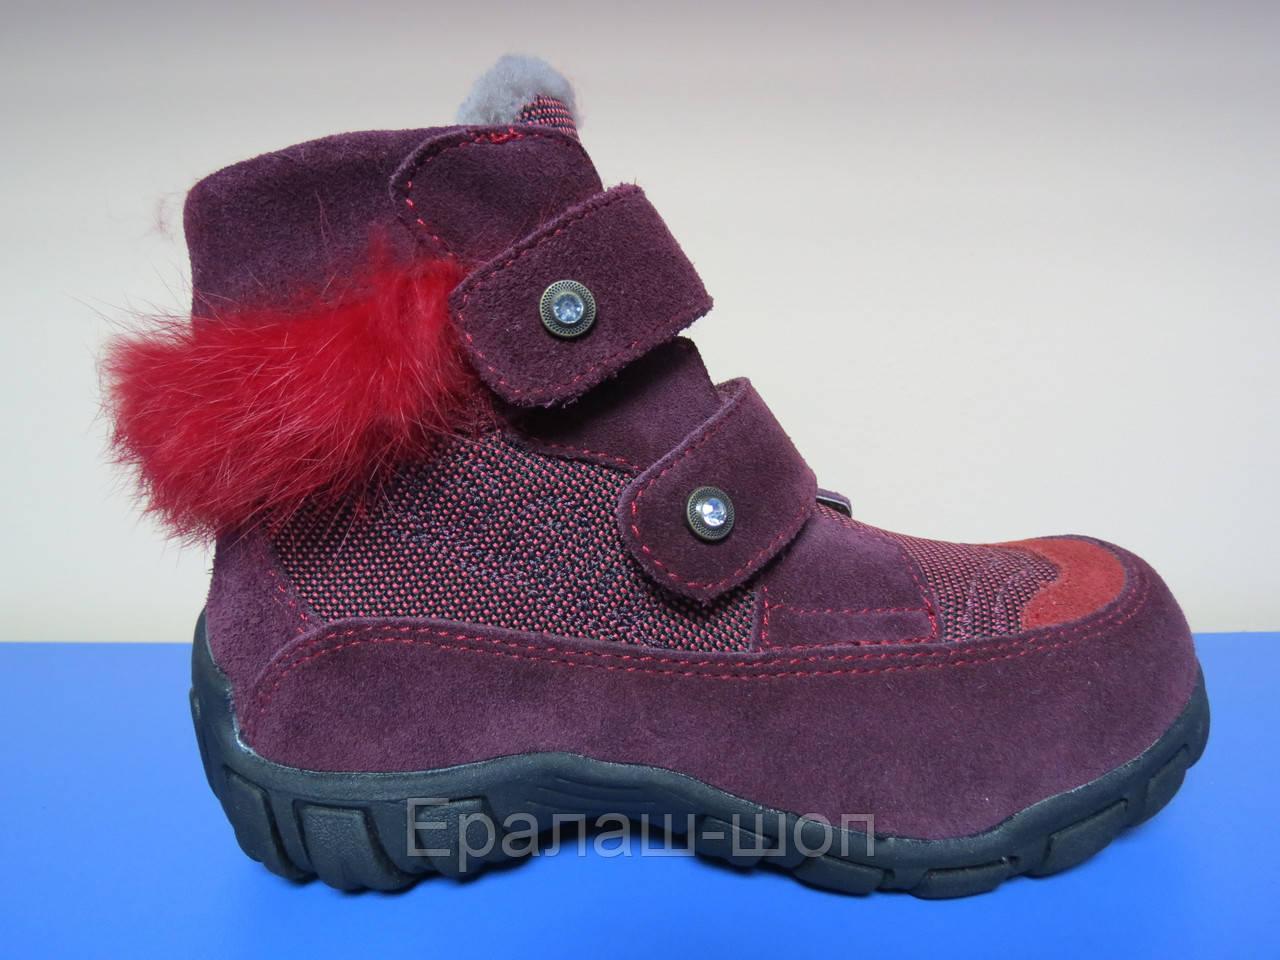 5447c37a5 Зимние ботинки/сапоги для девочки на цегейке тм Bloom 31р(20см стелька) -